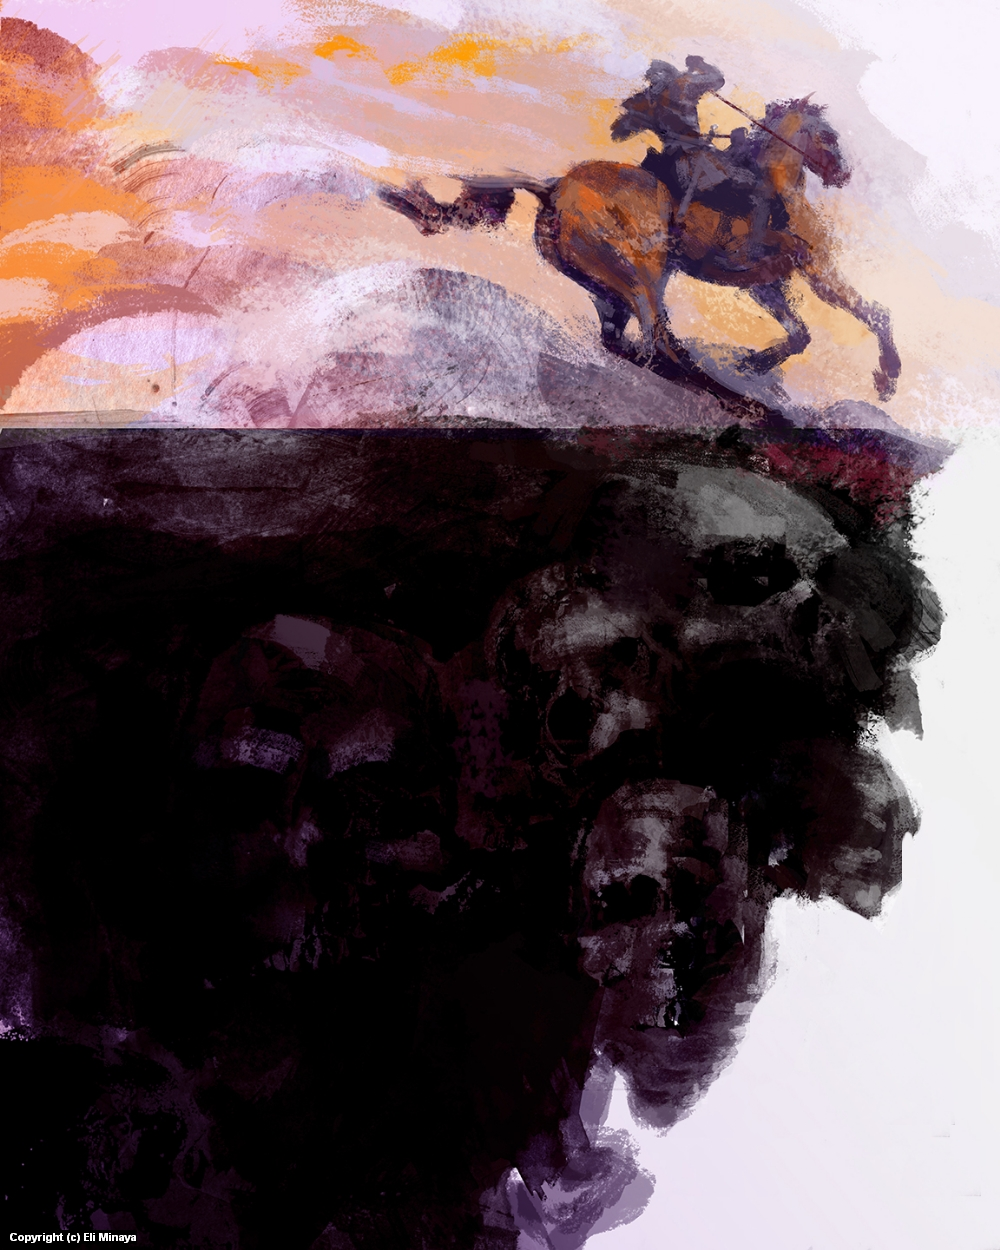 The Momentum of War Artwork by Eli Minaya